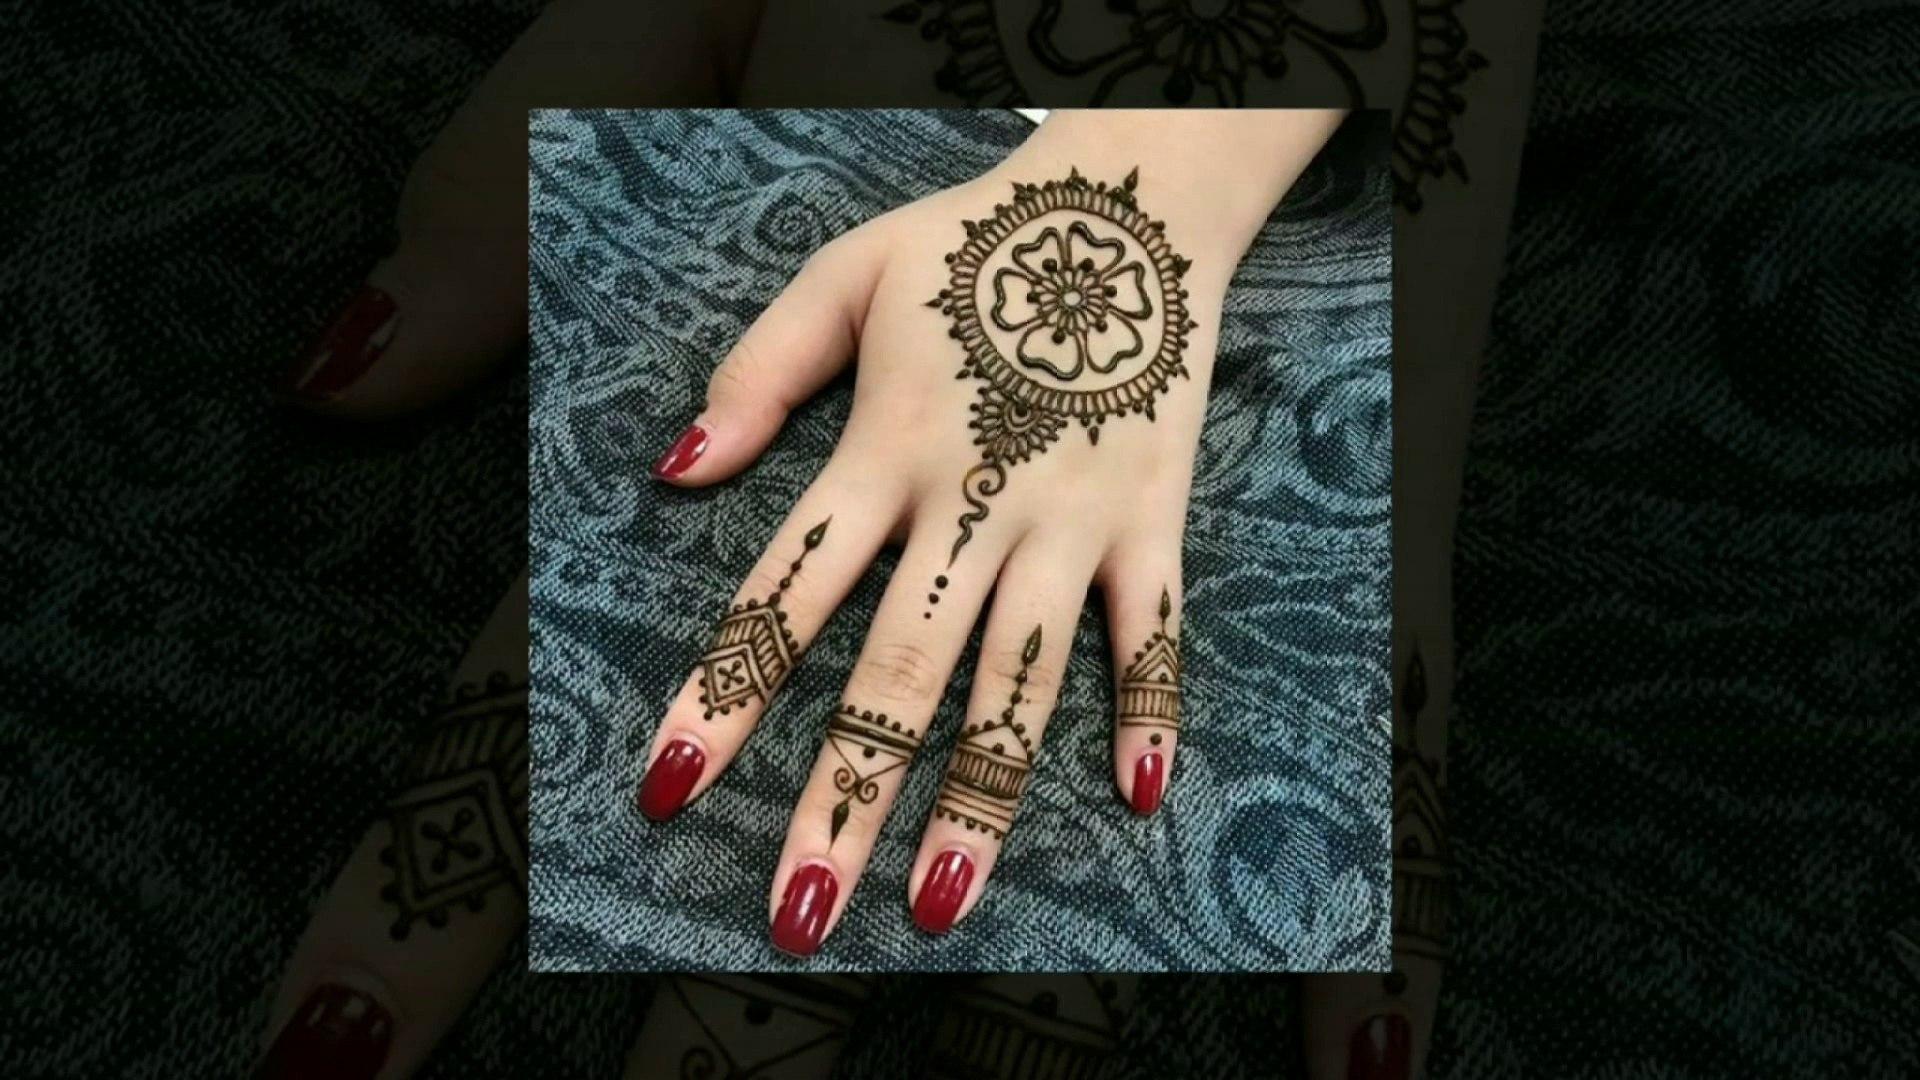 Make Stylish Round Shape Henna Design For Back Hand Gol Tikki Mehndi Design 2019 Mmp Video Dailymotion,Backyard Contemporary Landscape Design